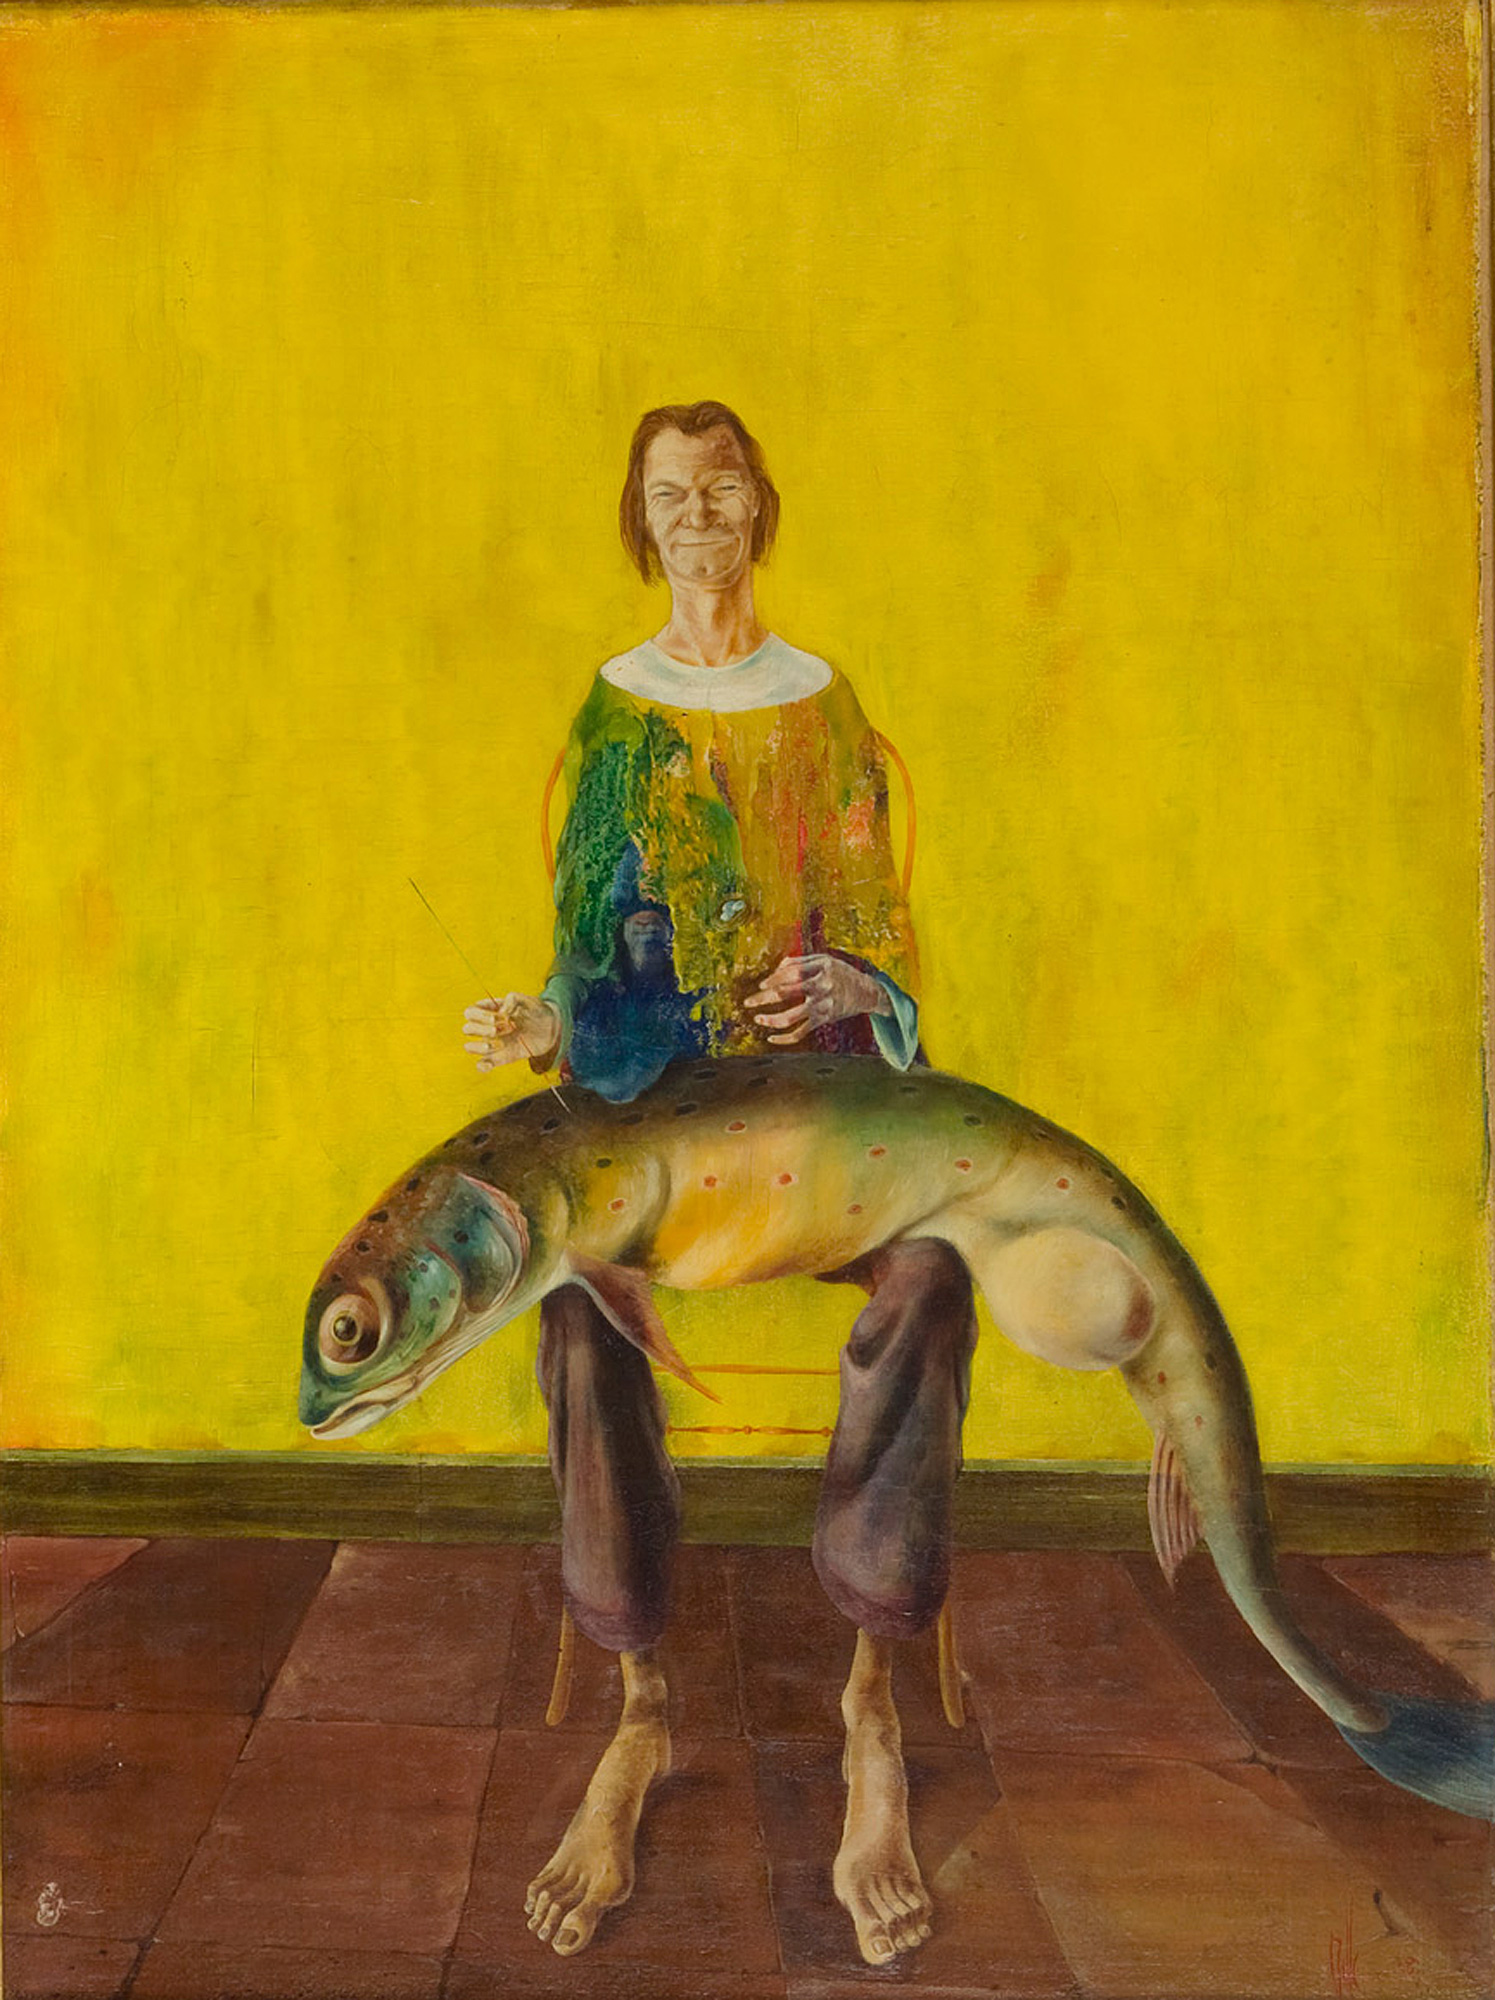 Melle schilder   Zelfportret, olieverf op linnen